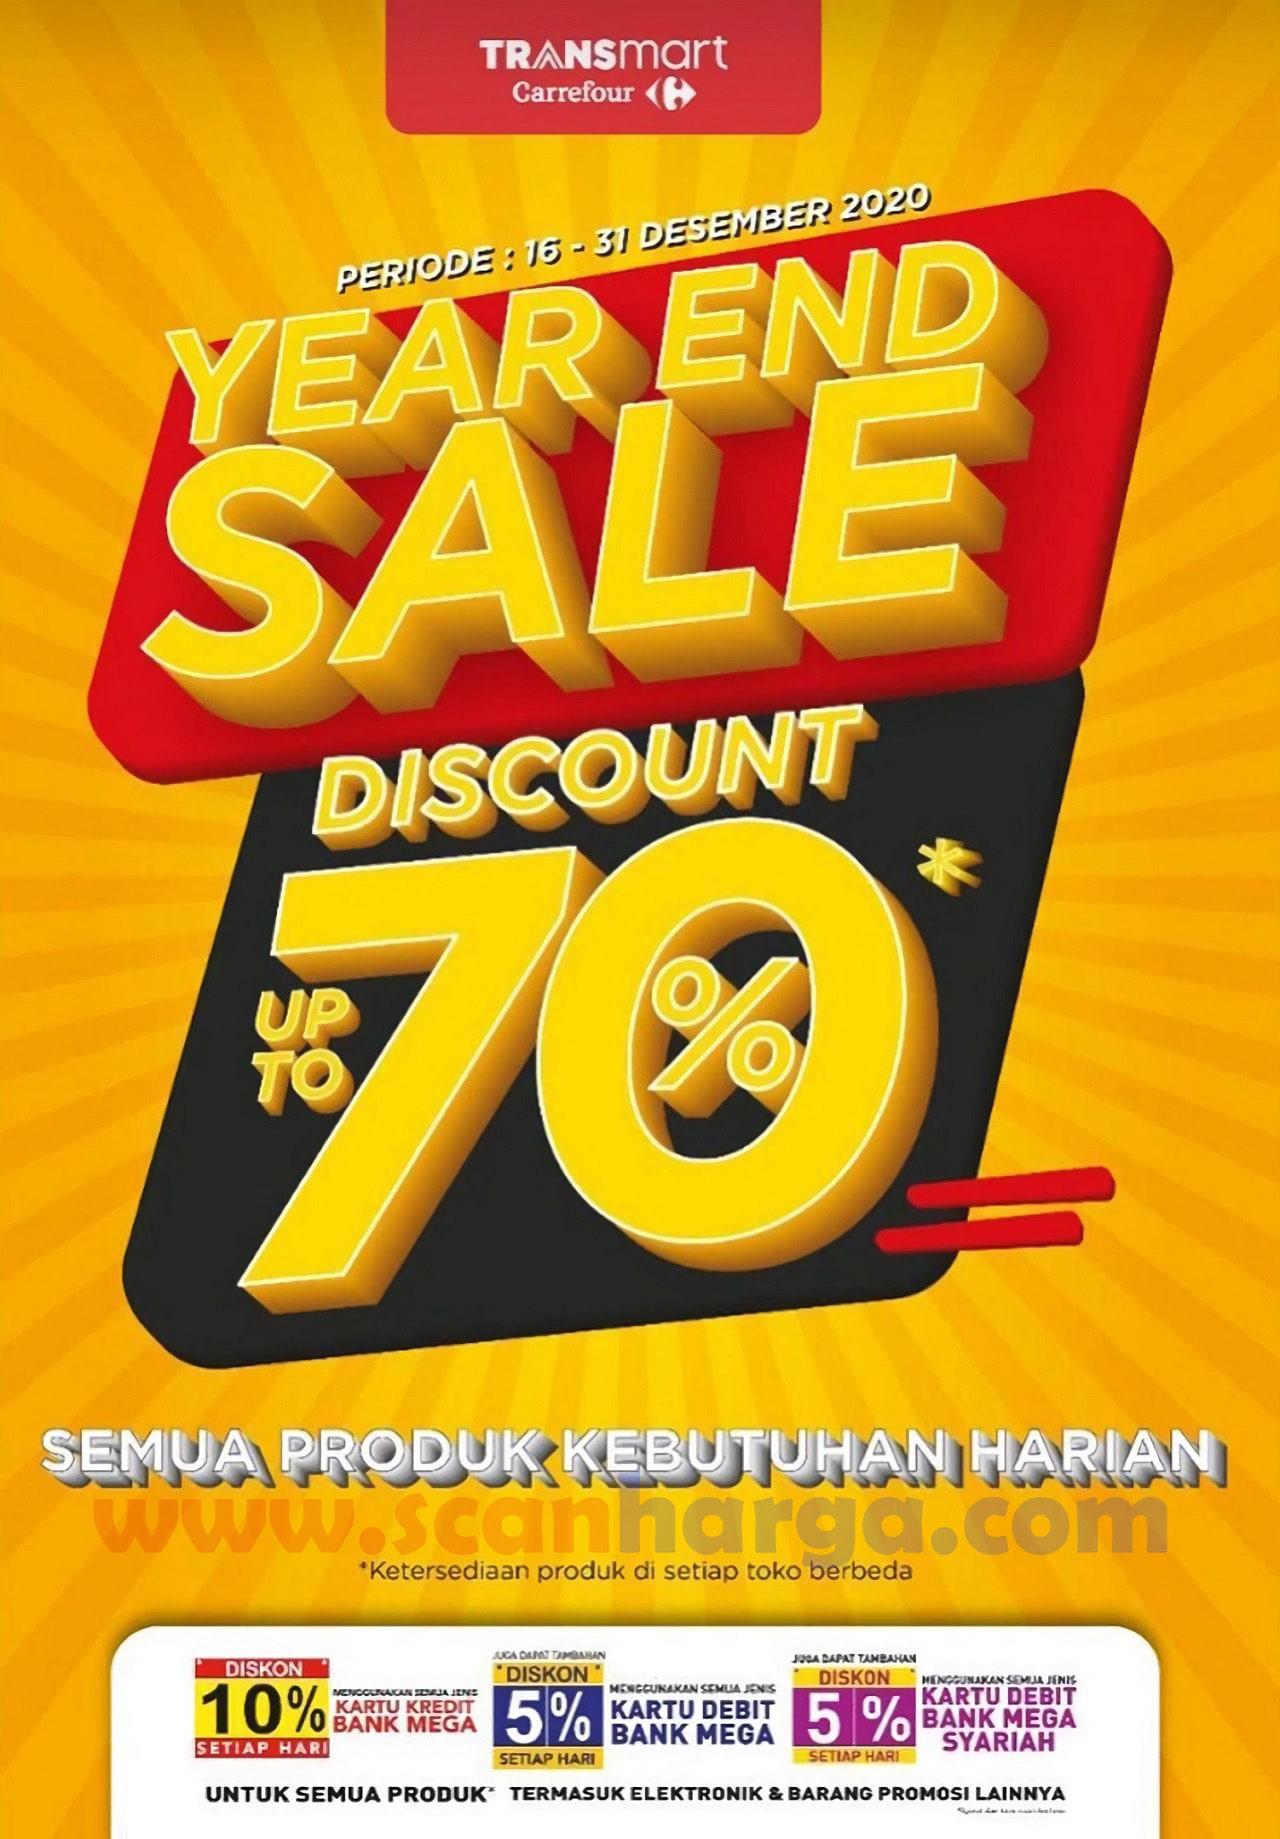 Carrefour Transmart Promo Year End Sale – DISKON 70% Semua Produk Kebutuhan Harian